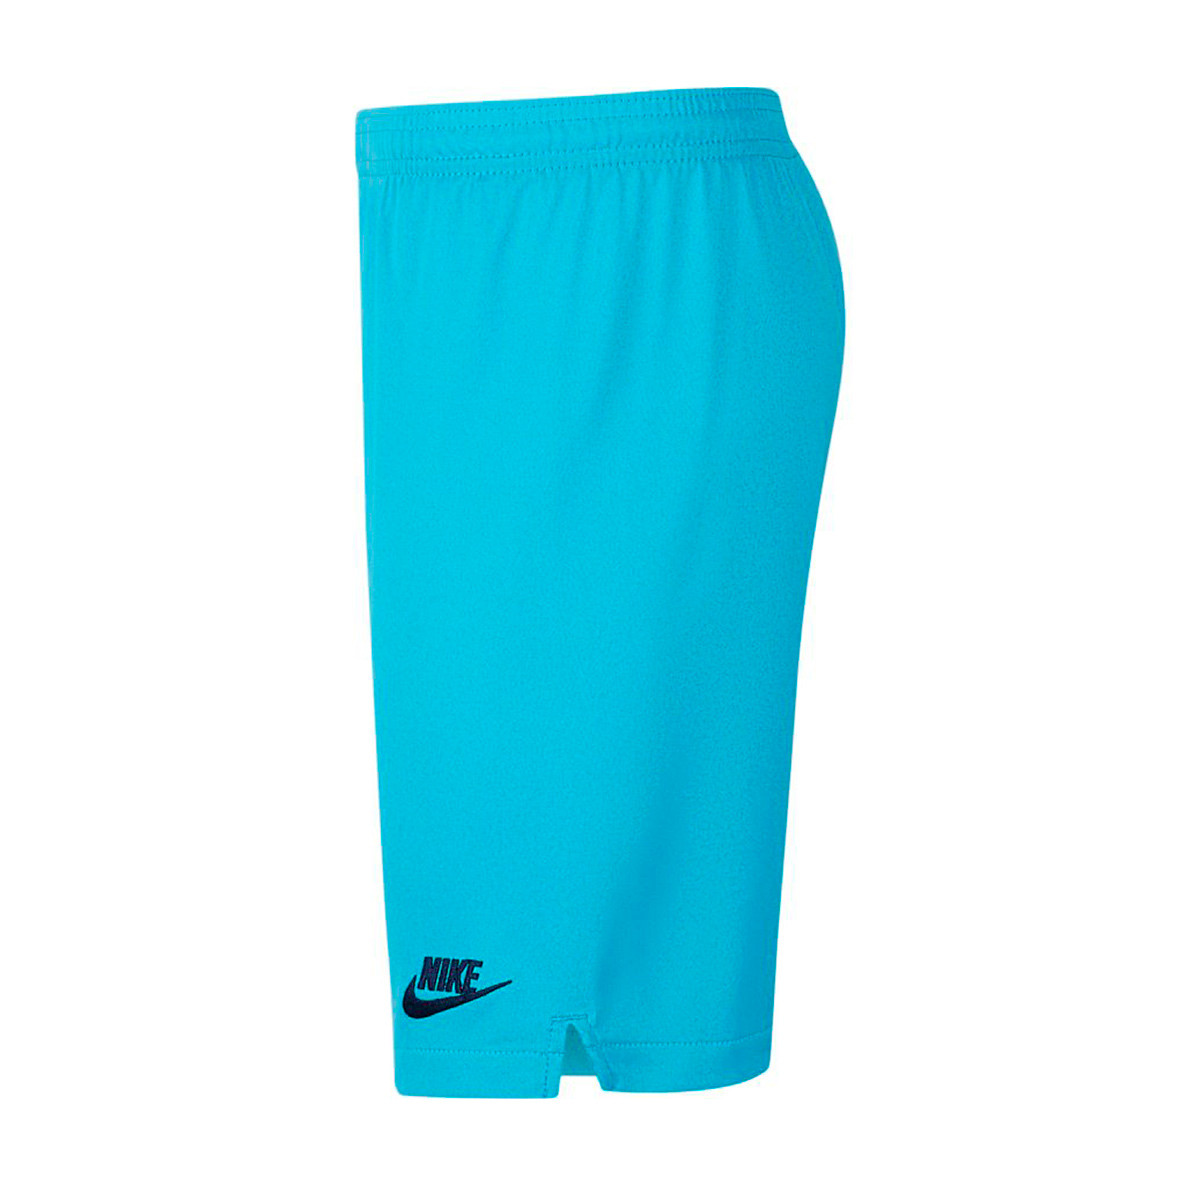 Shorts Nike Kids Tottenham Hotspur Breathe Stadium 2019 2020 Third Blue Fury Binary Blue Football Store Futbol Emotion